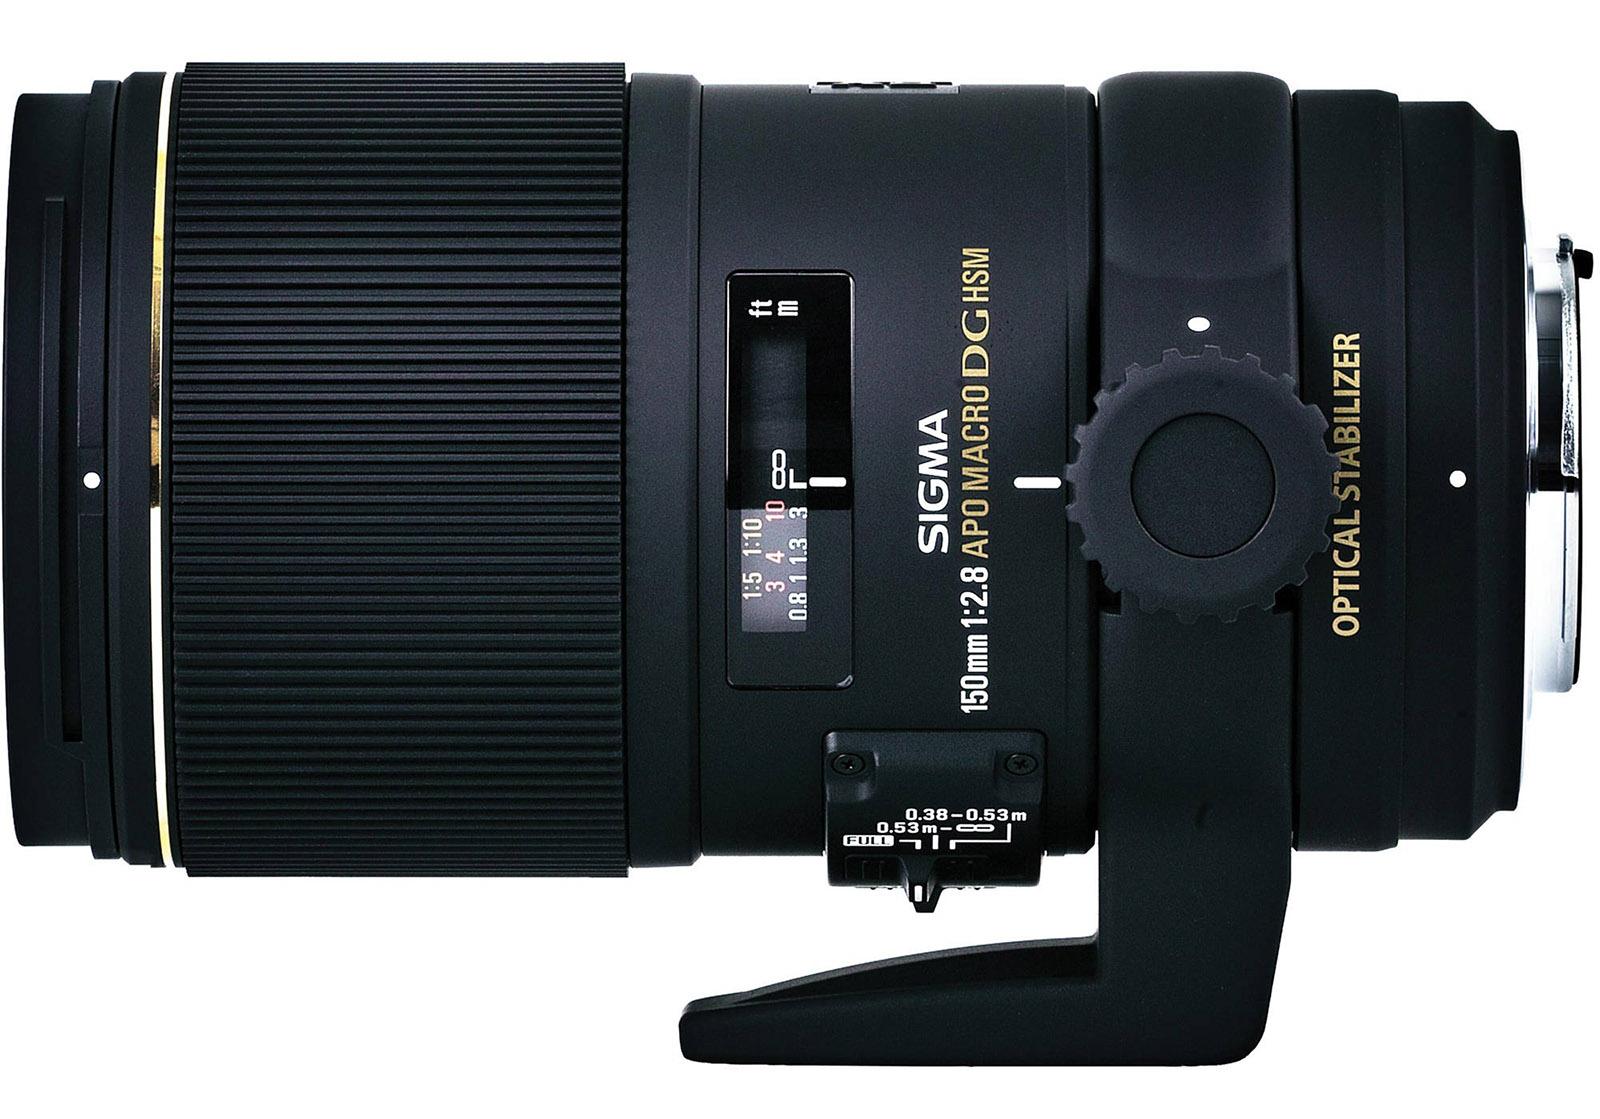 foto van De Sigma 2,8/150 mm Apo Macro lens